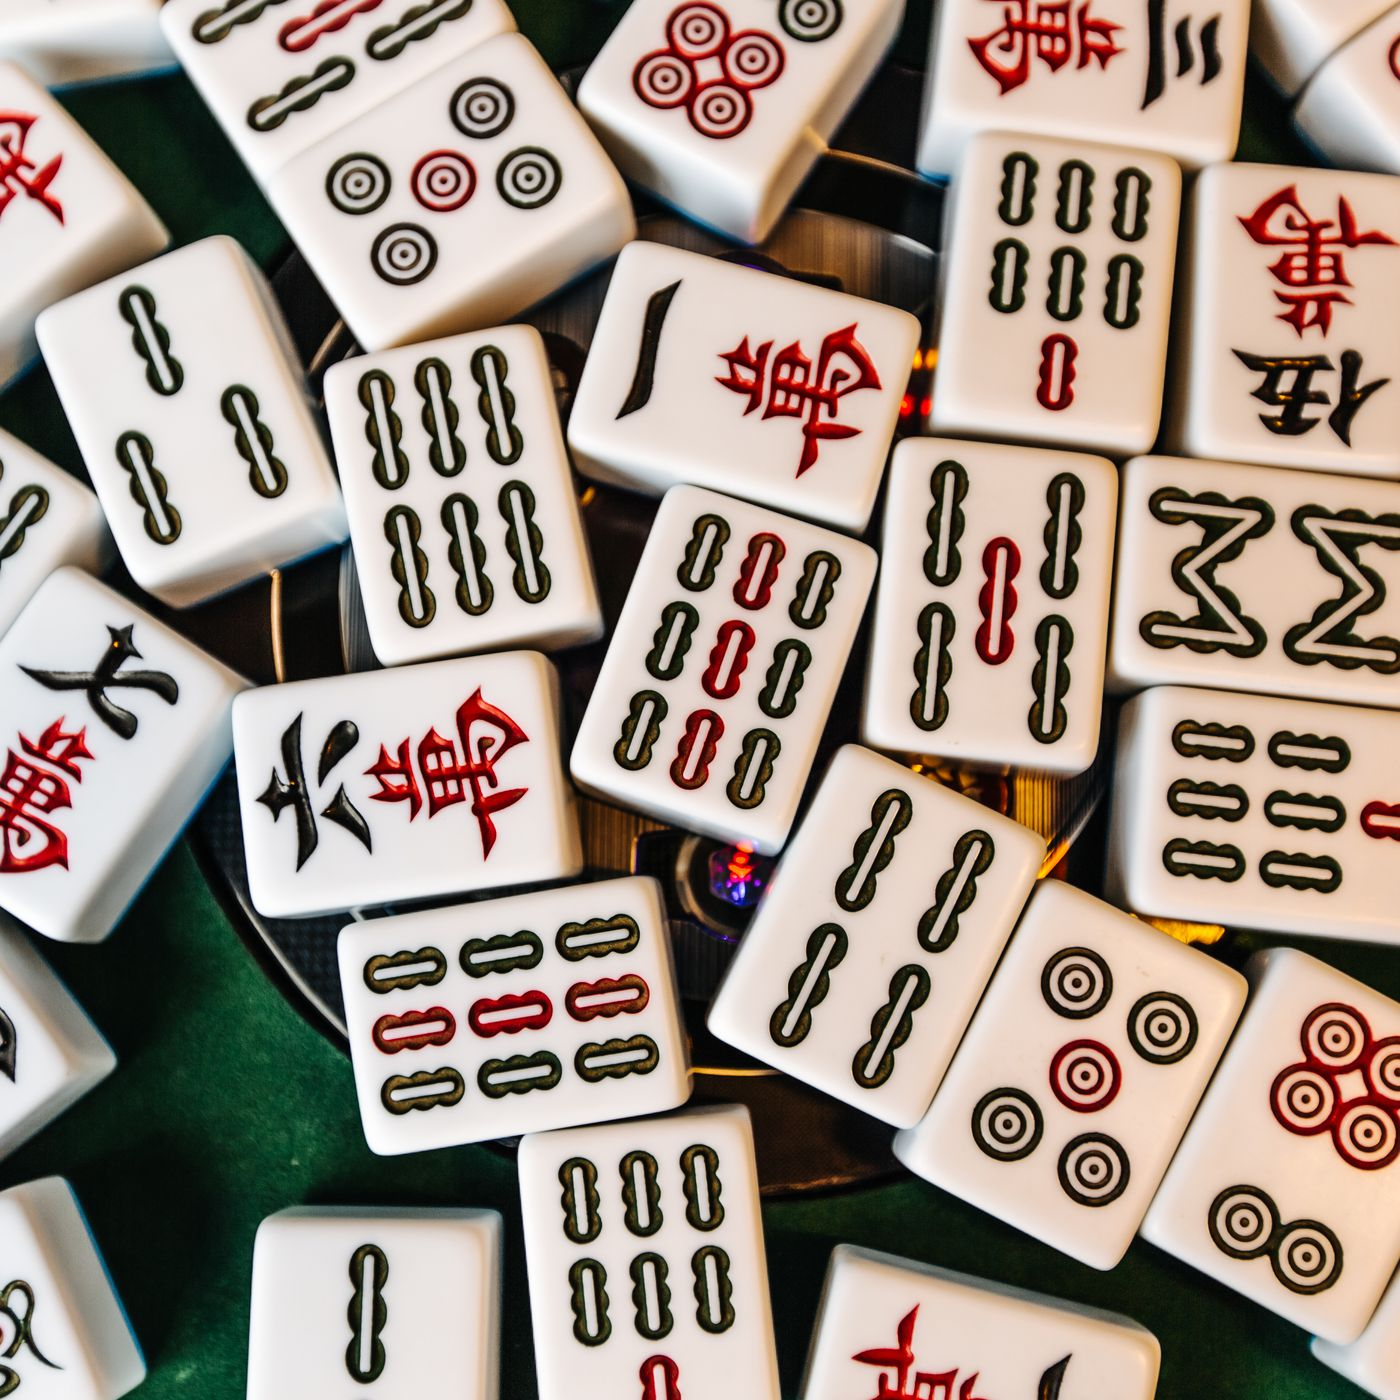 Crazy Rich Asians Mahjong Scene Explained Vox